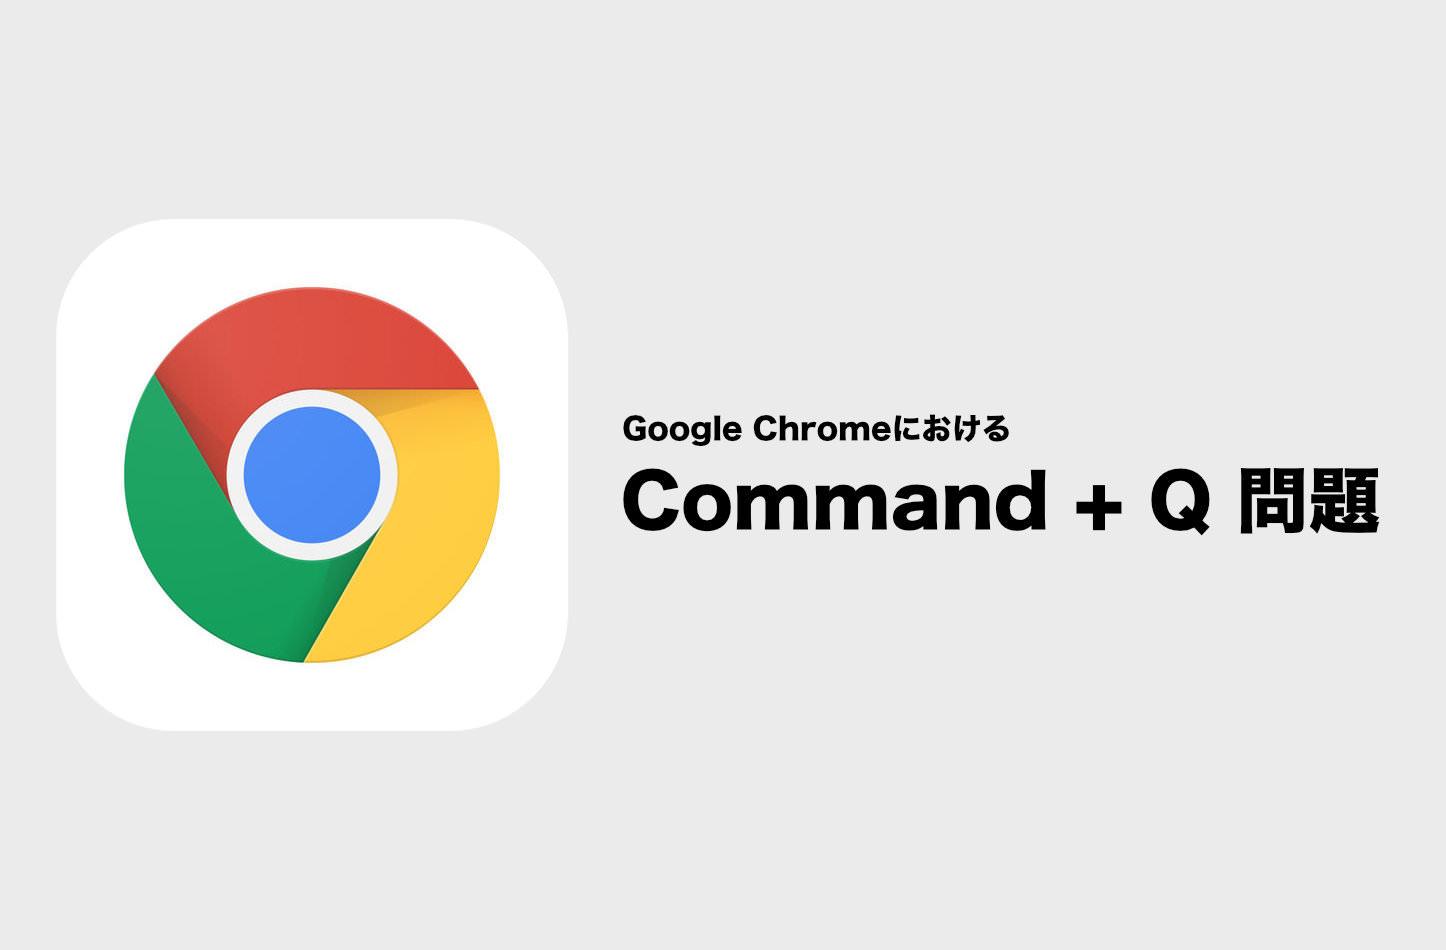 Google-Chrome-Command-Q-Problem.jpg